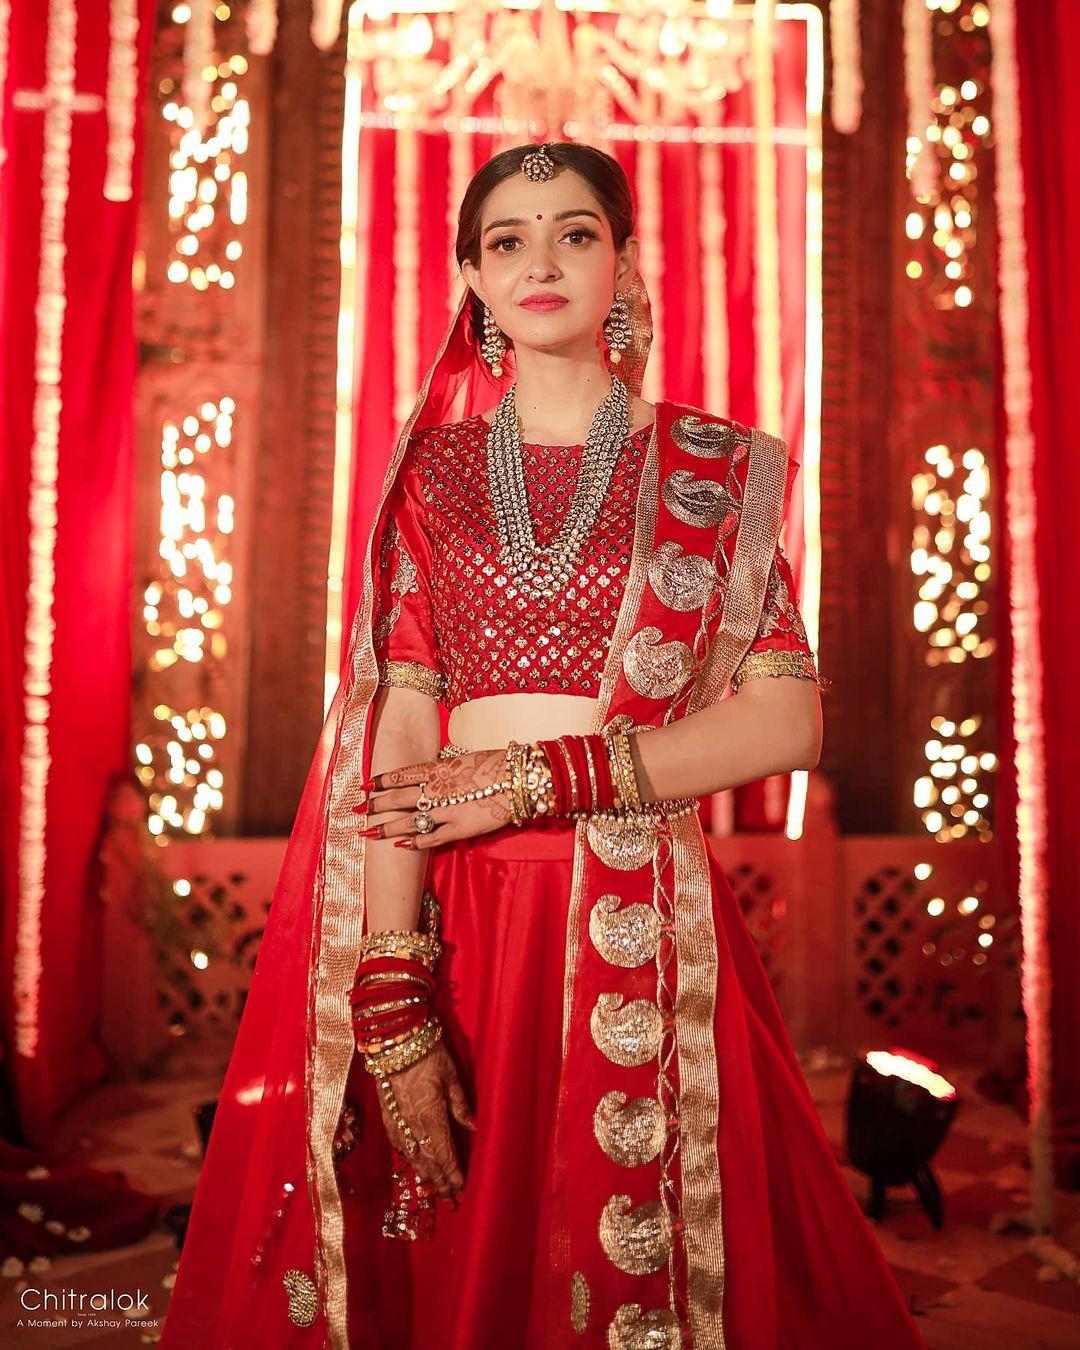 Kunaal verma's wife